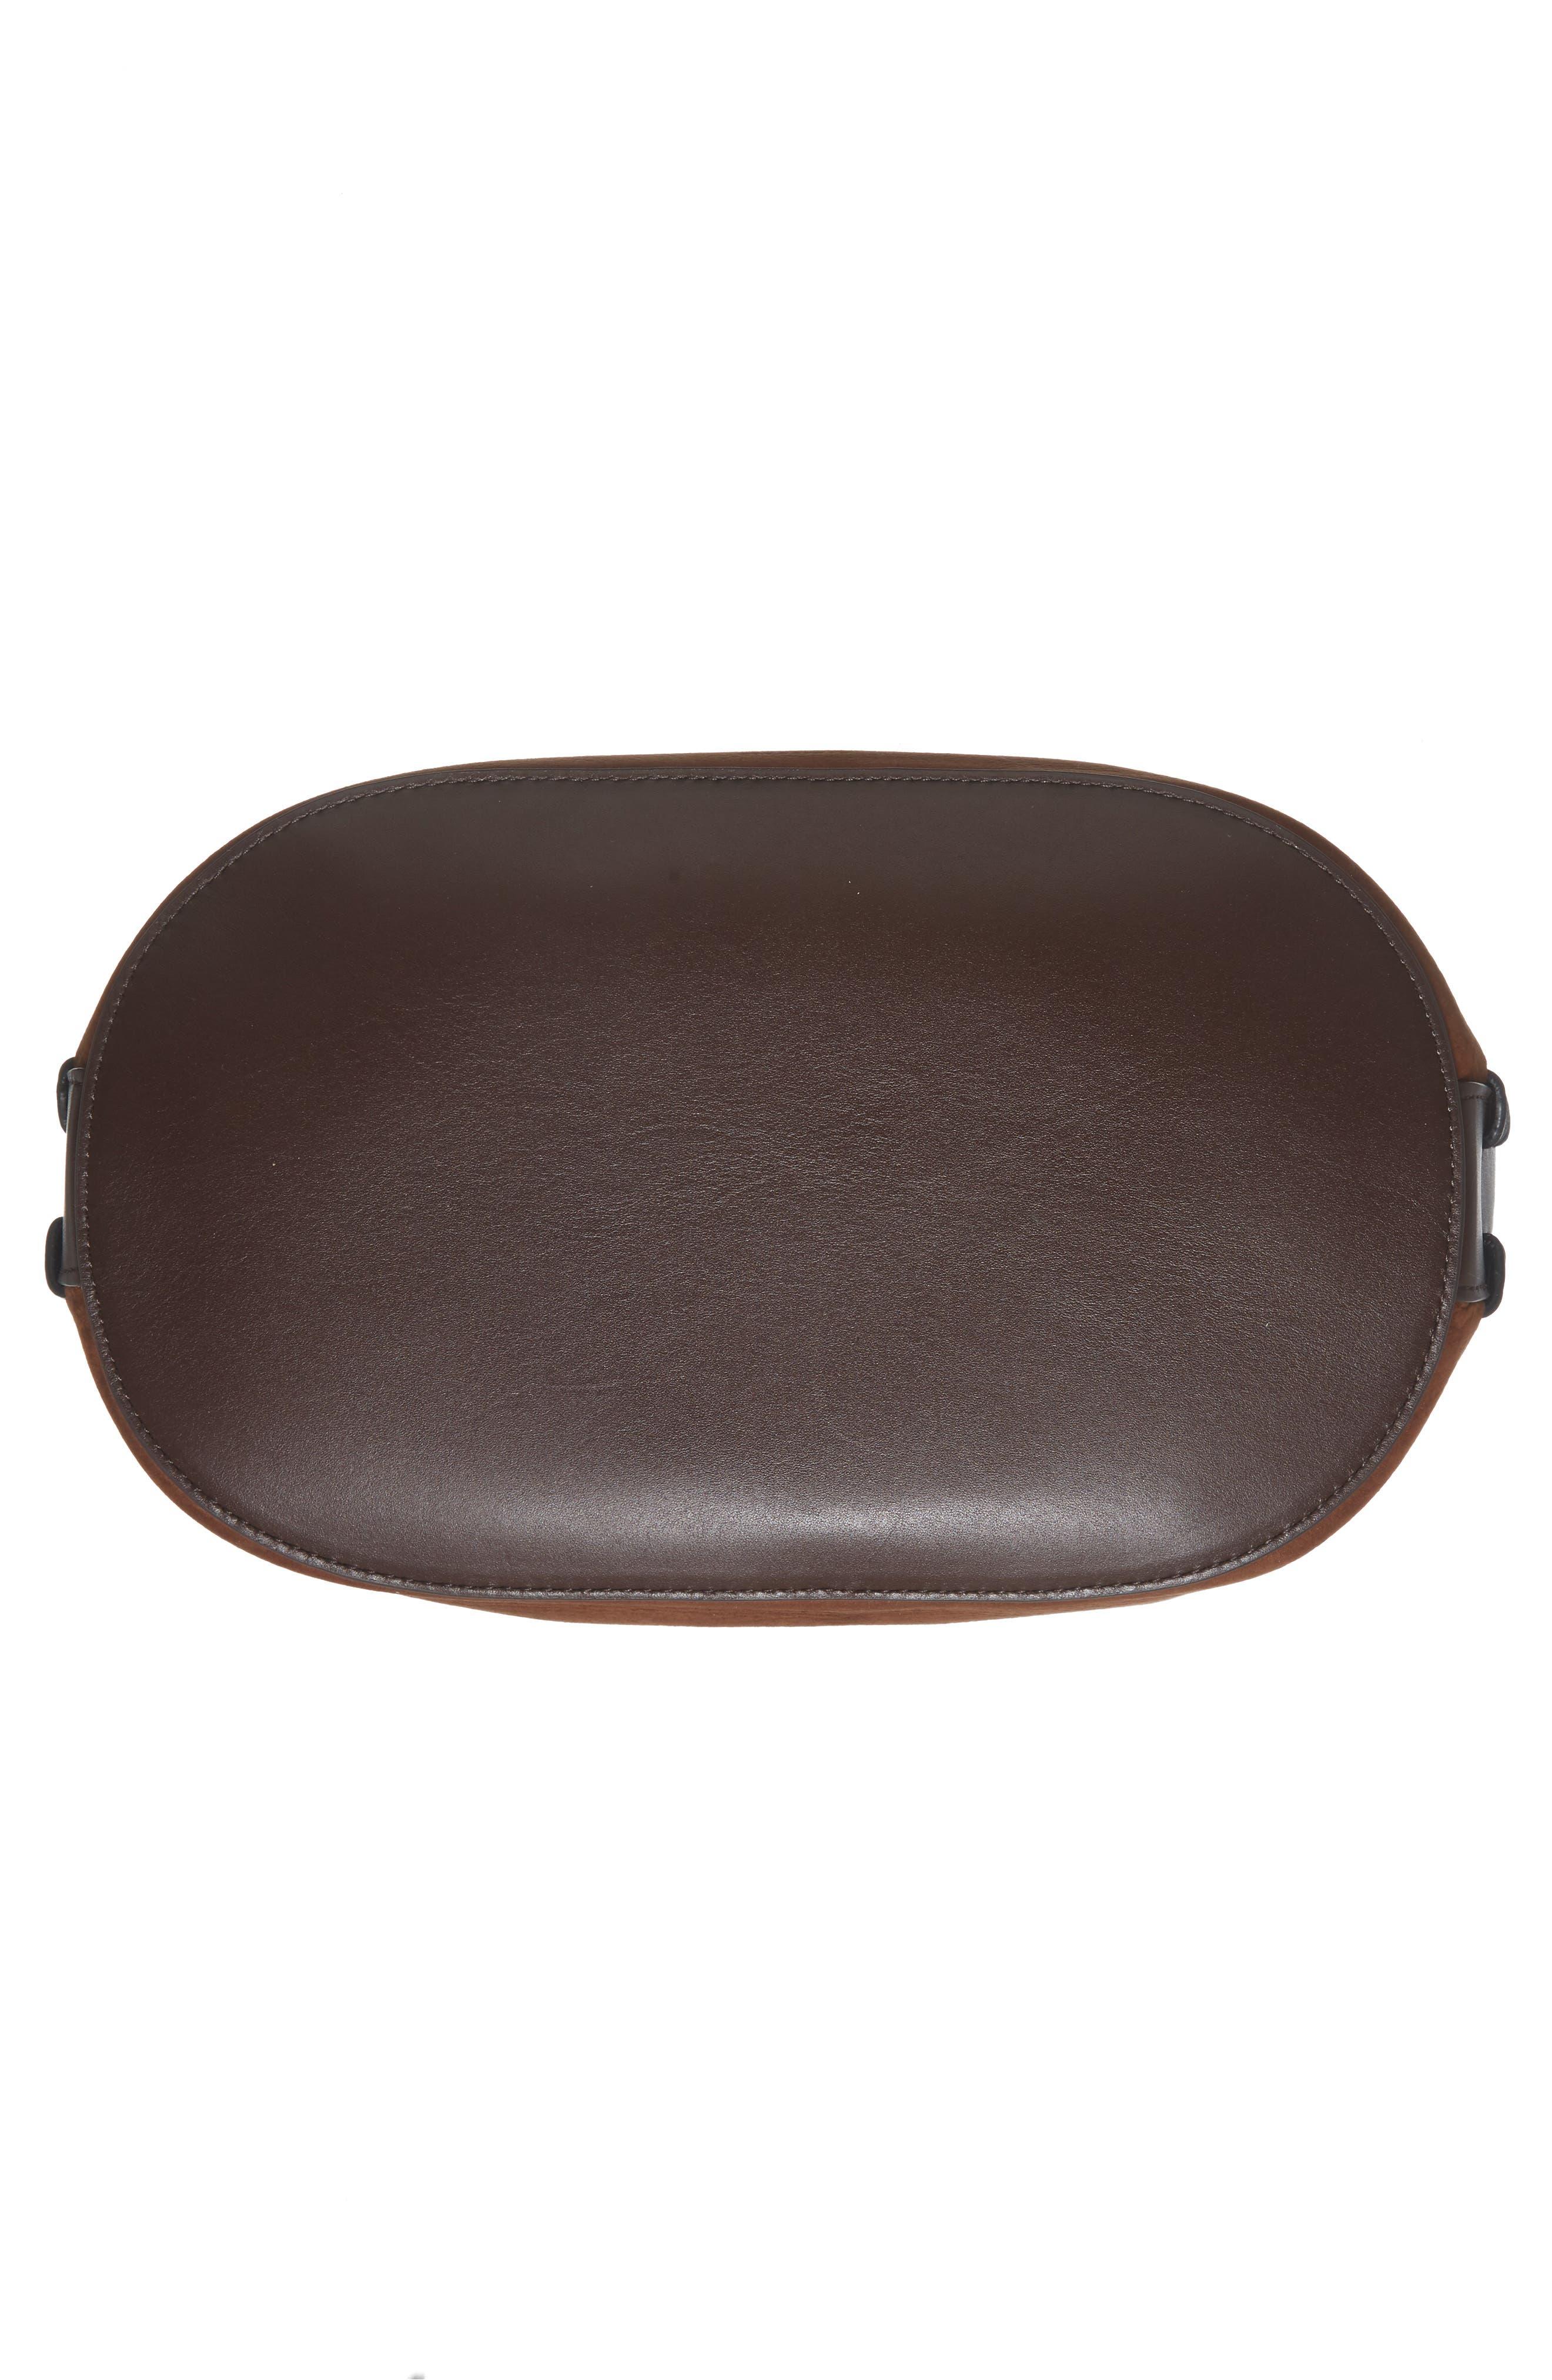 Ray Nubuck Leather Bucket Bag,                             Alternate thumbnail 6, color,                             200